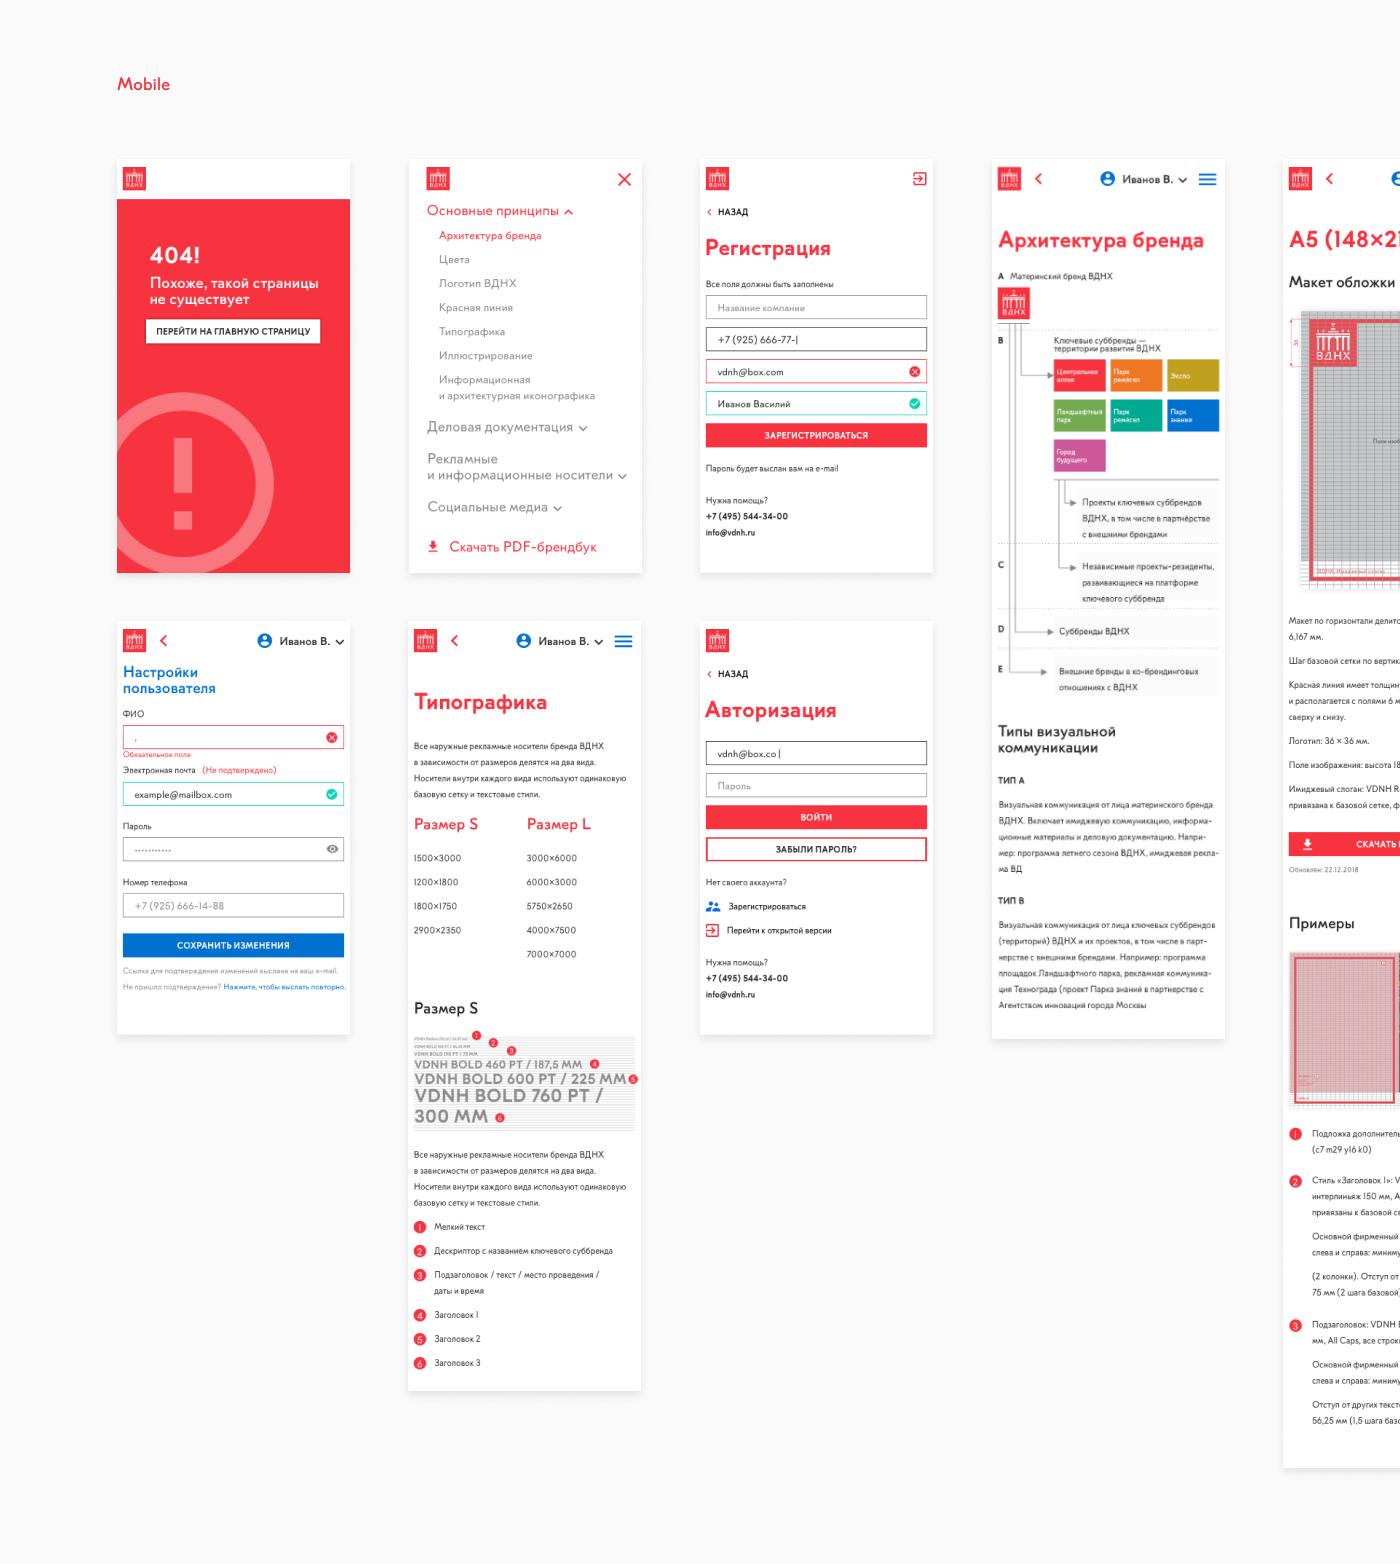 Web brand design mobile Adaptive UI ux graphic site Interface